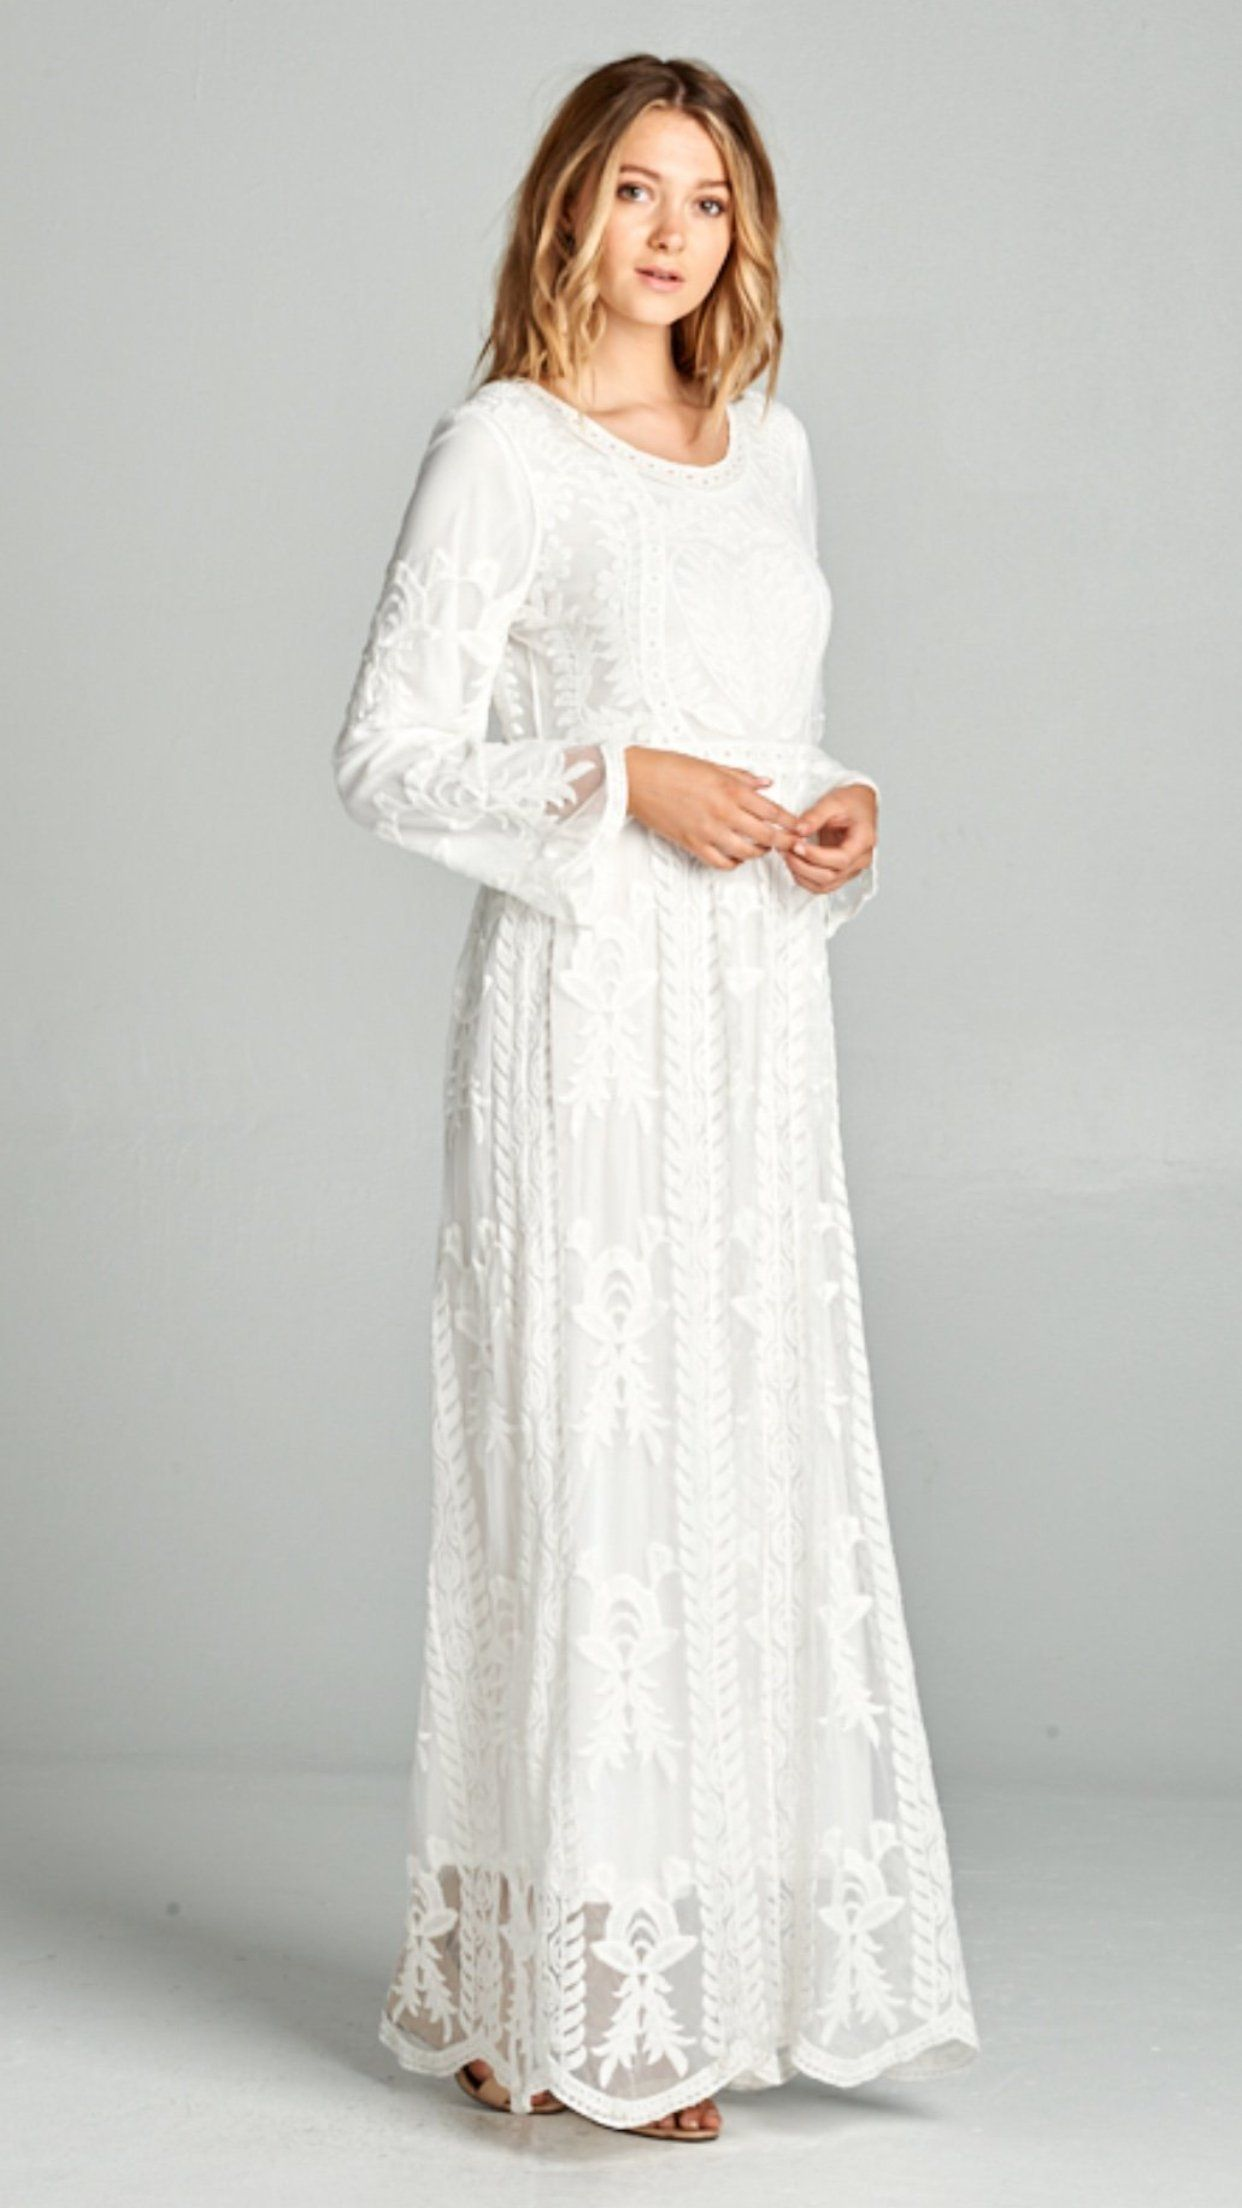 37+ Long white lace dress ideas